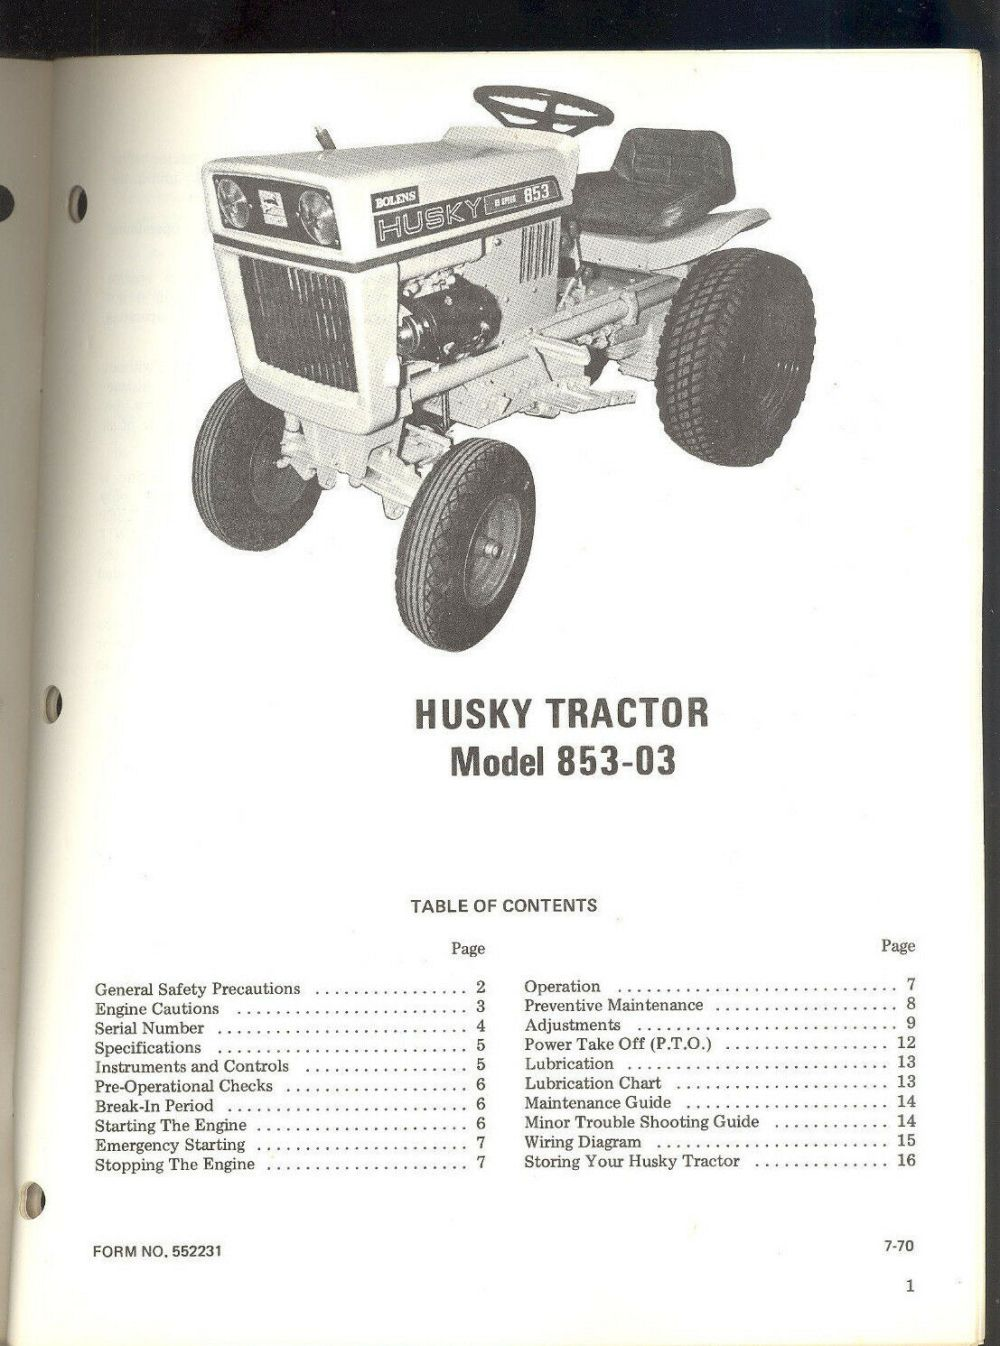 medium resolution of 1 of 3 1970 bolens husky tractor model 853 03 owners operators maintenance manual